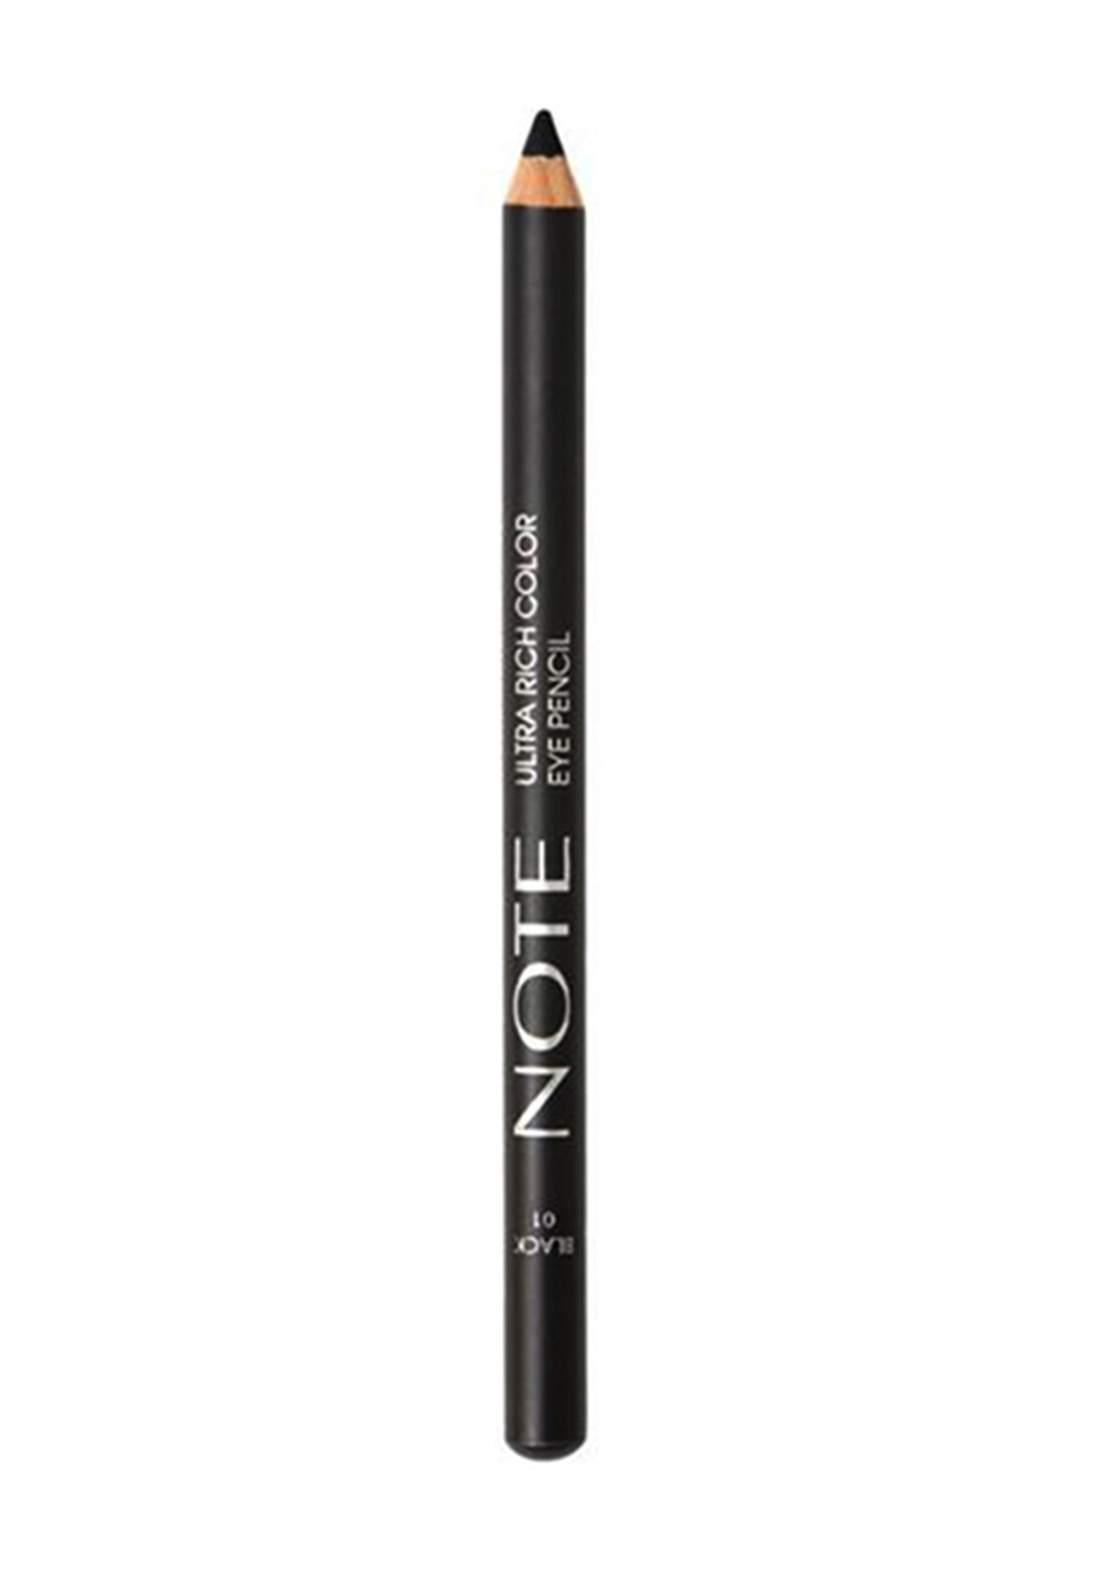 Note Ultra Rich Colour Eye Pencil 01 BLack 1.1g قلم تحديد للعيون